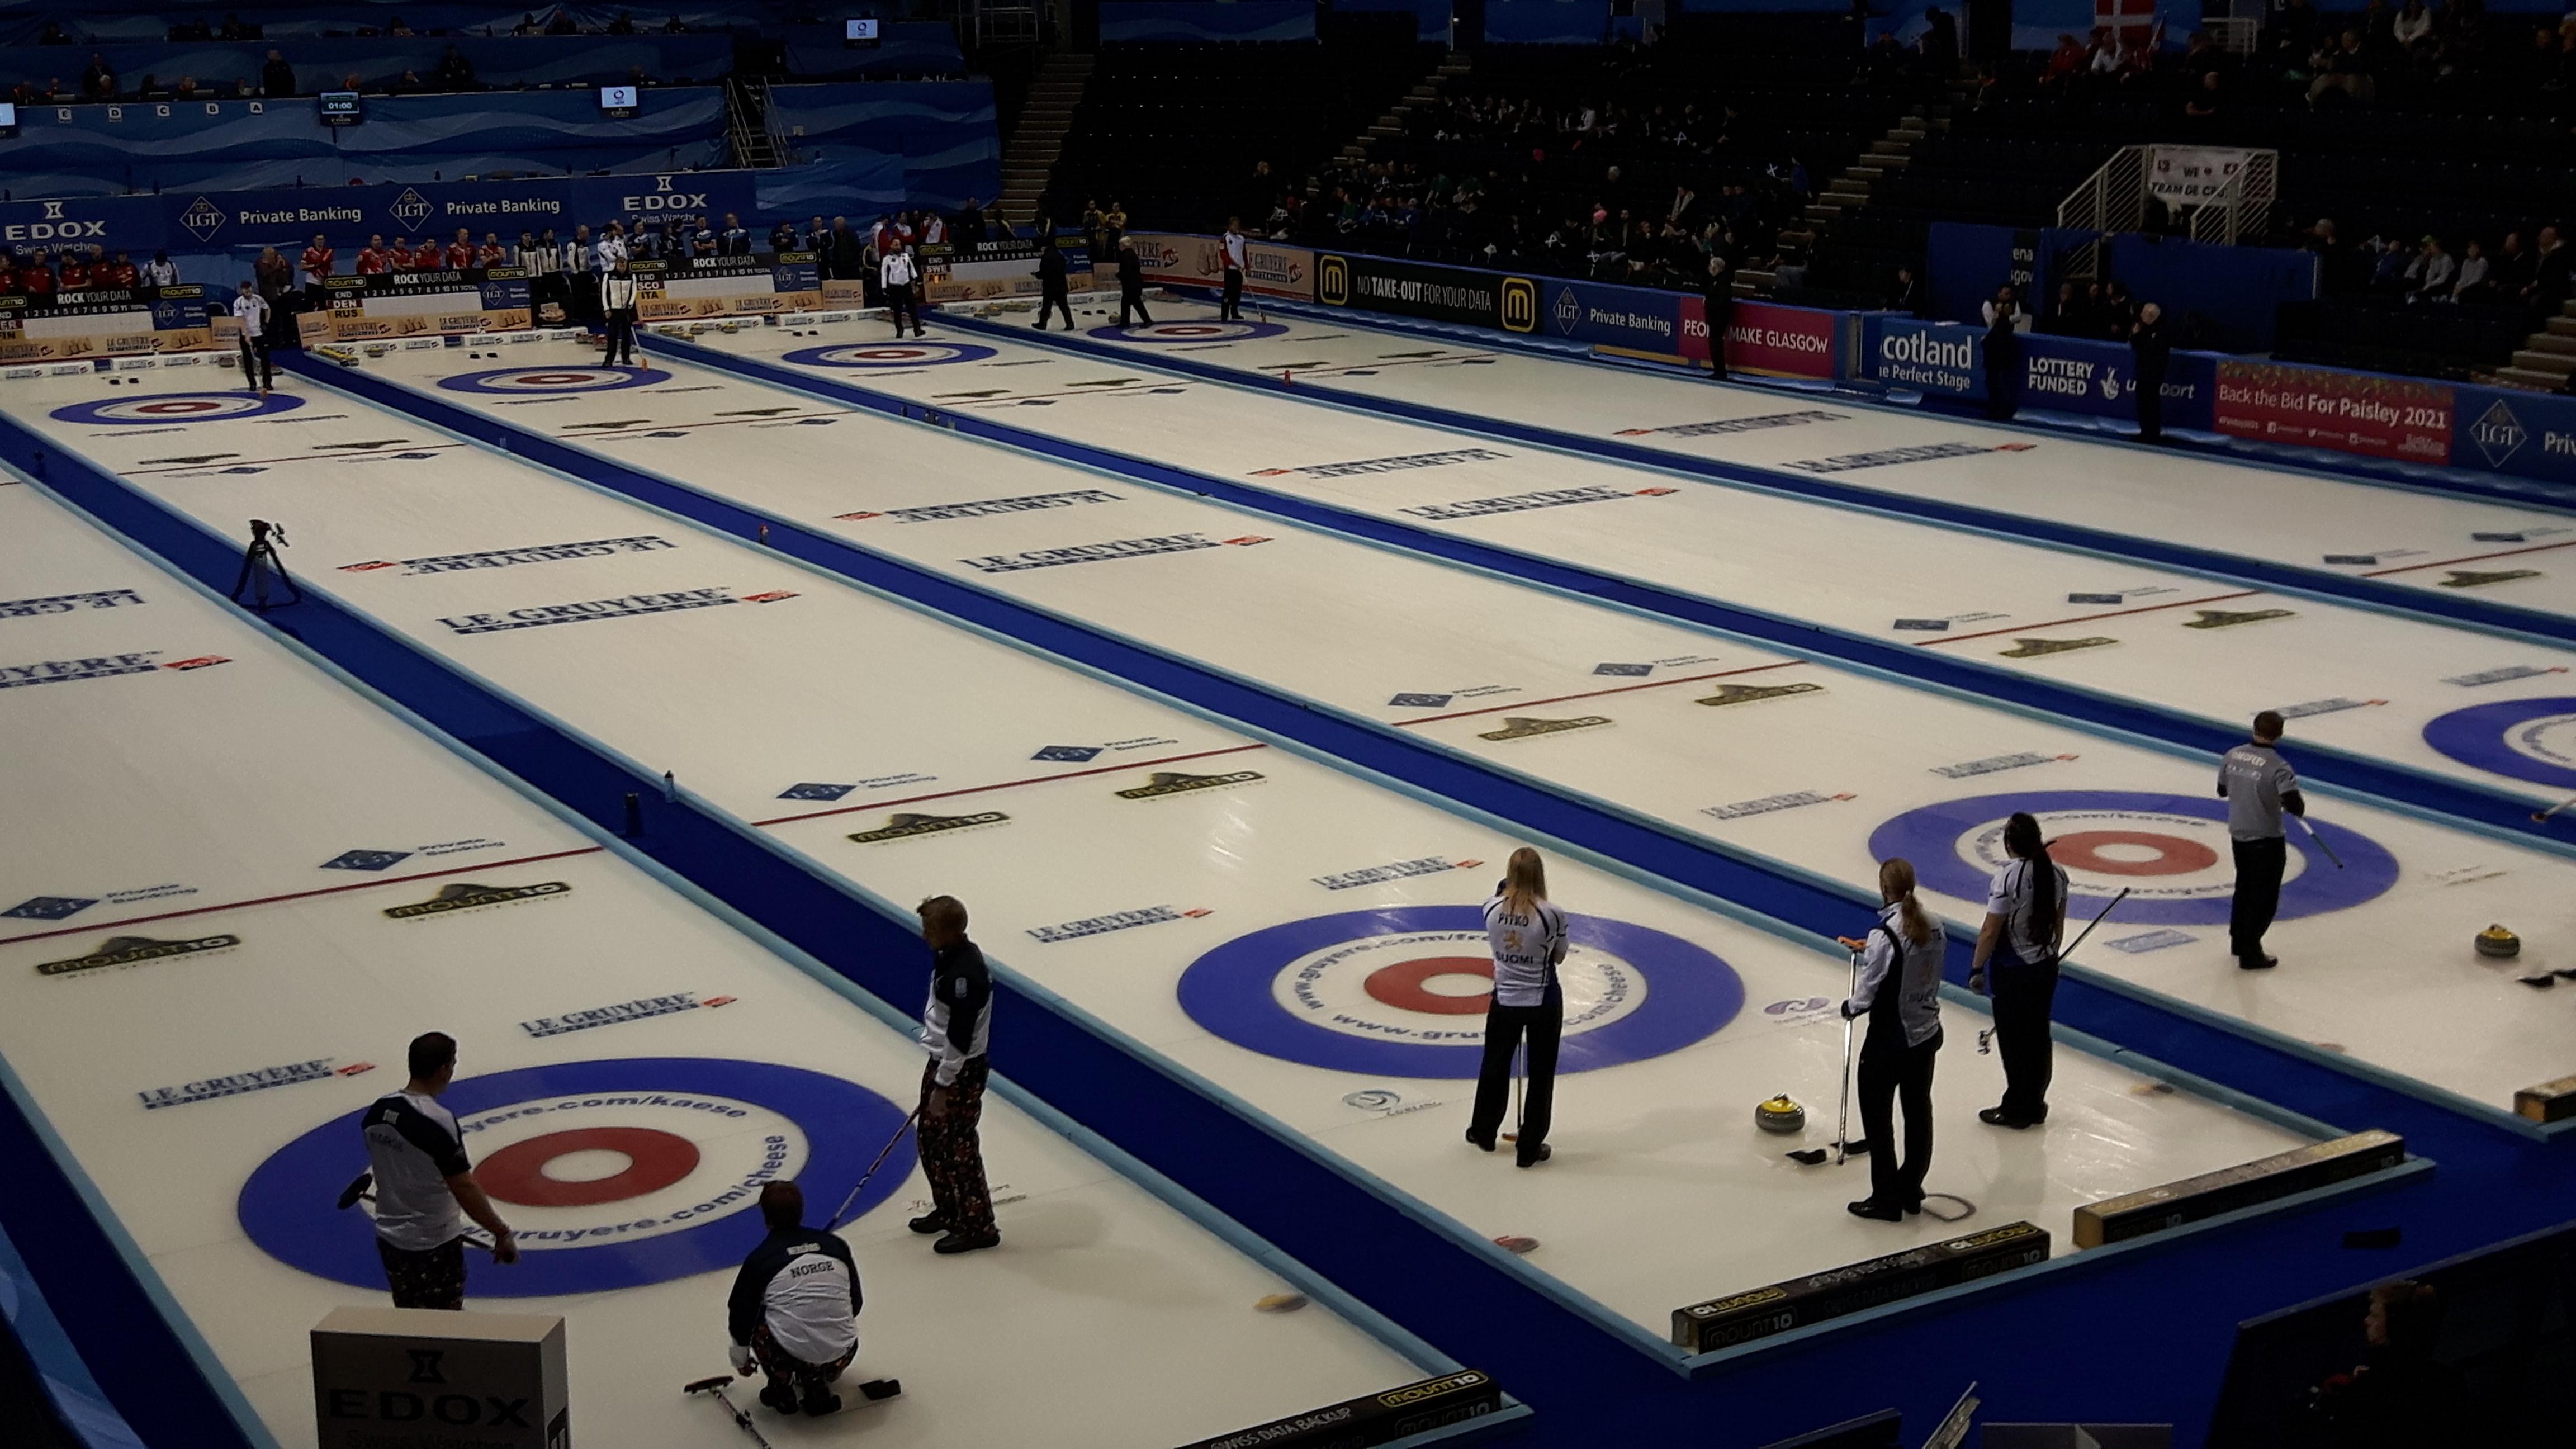 European Curling Championships bring £750,000 boost to Renfrewshire economy